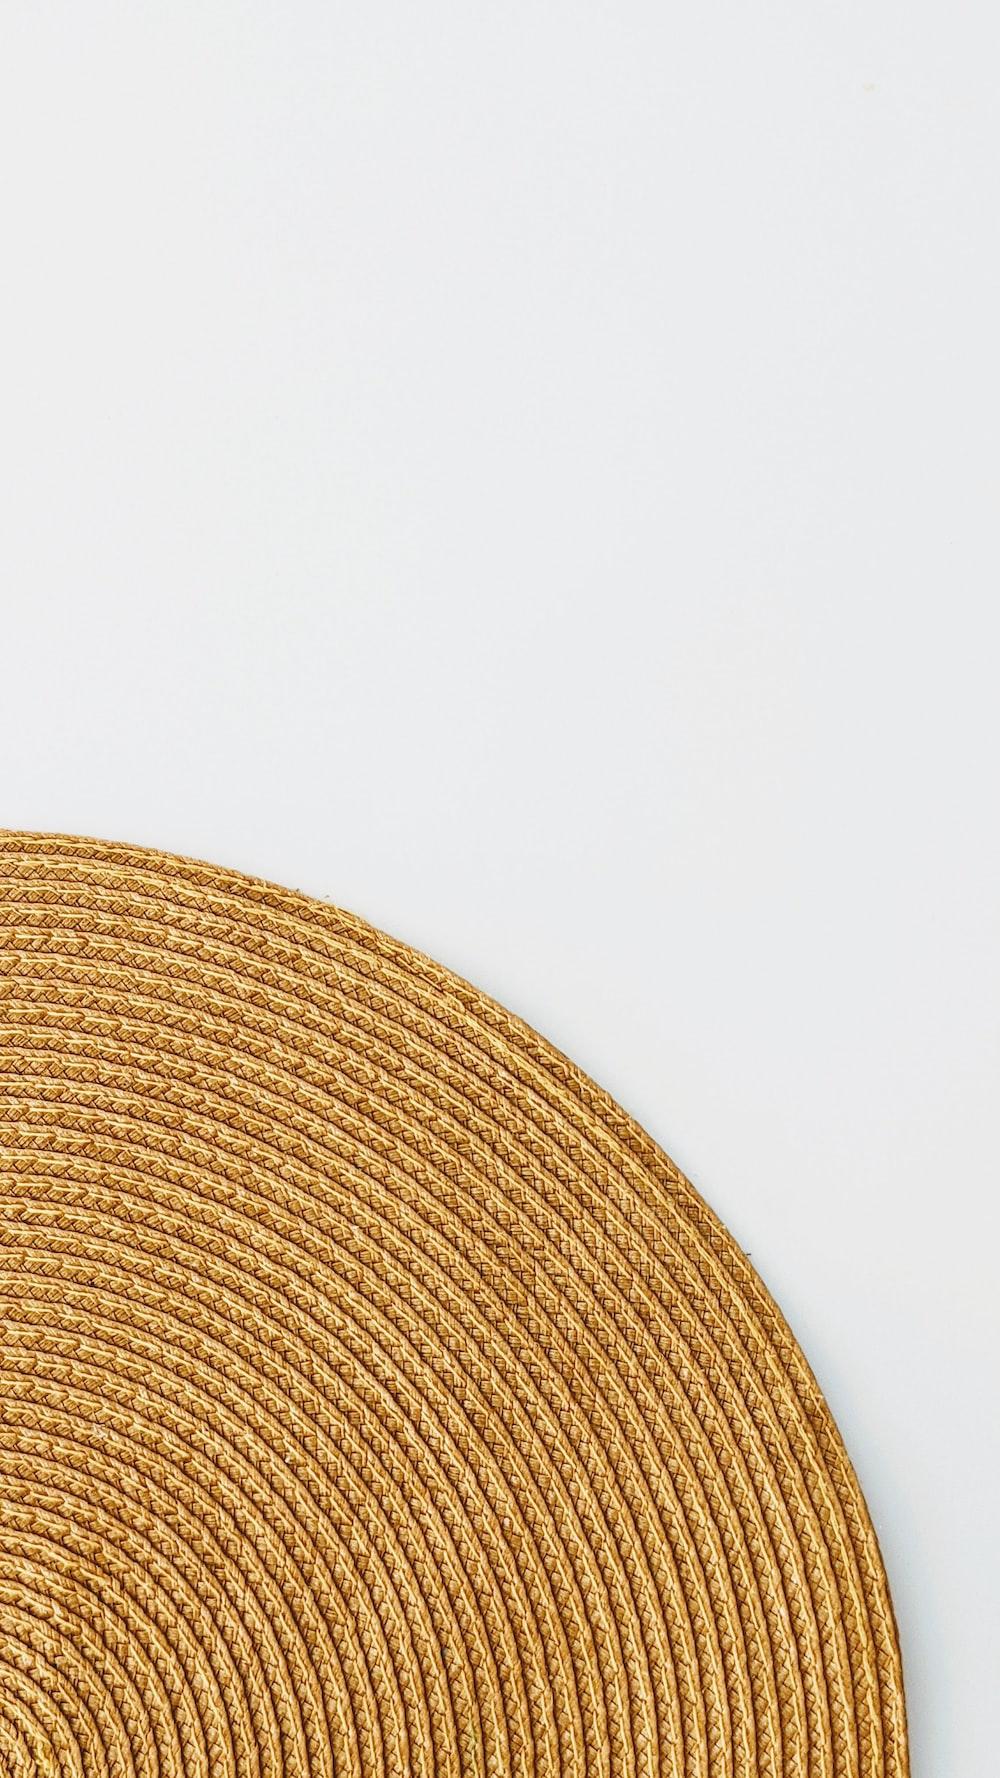 brown round textile on white surface